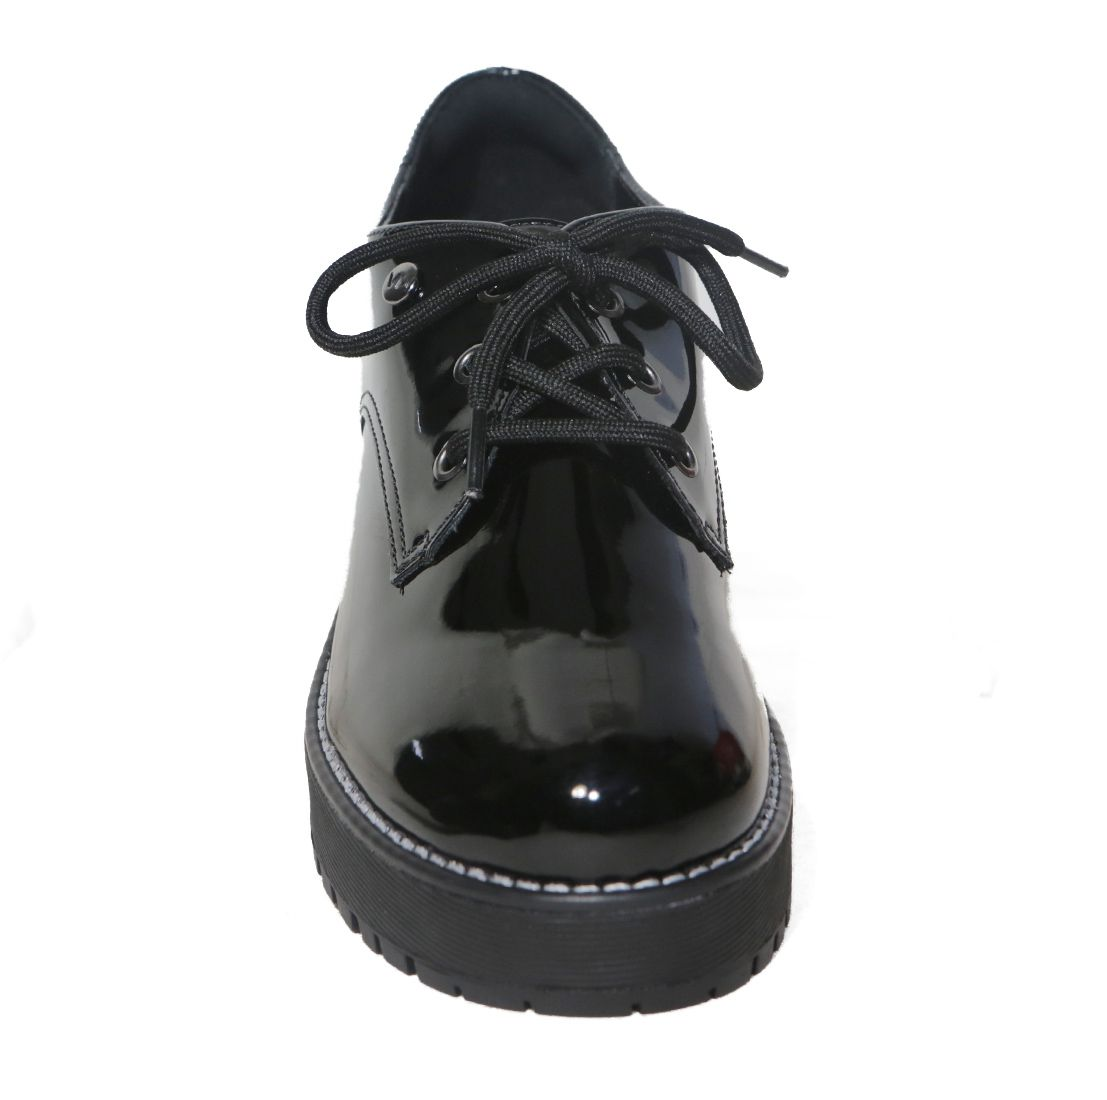 Sapato oxford Via Marte Feminino 20-7305 Tratorado